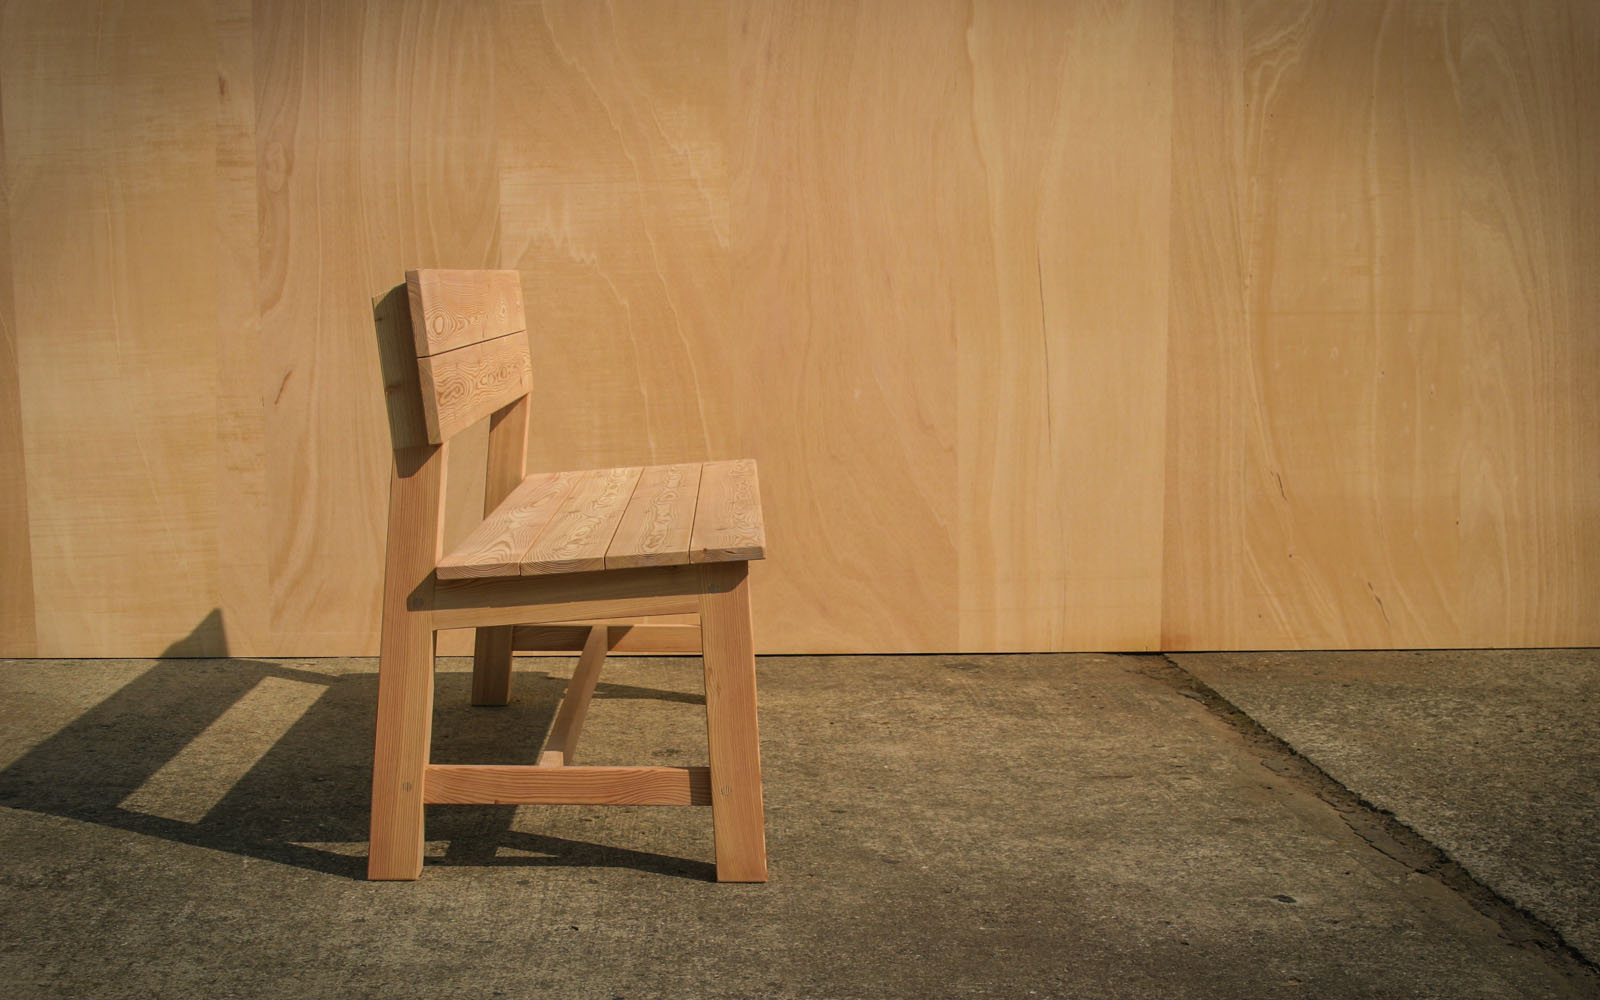 g a r t e n m b e l sitzbank hausbank holztisch hochbeet. Black Bedroom Furniture Sets. Home Design Ideas